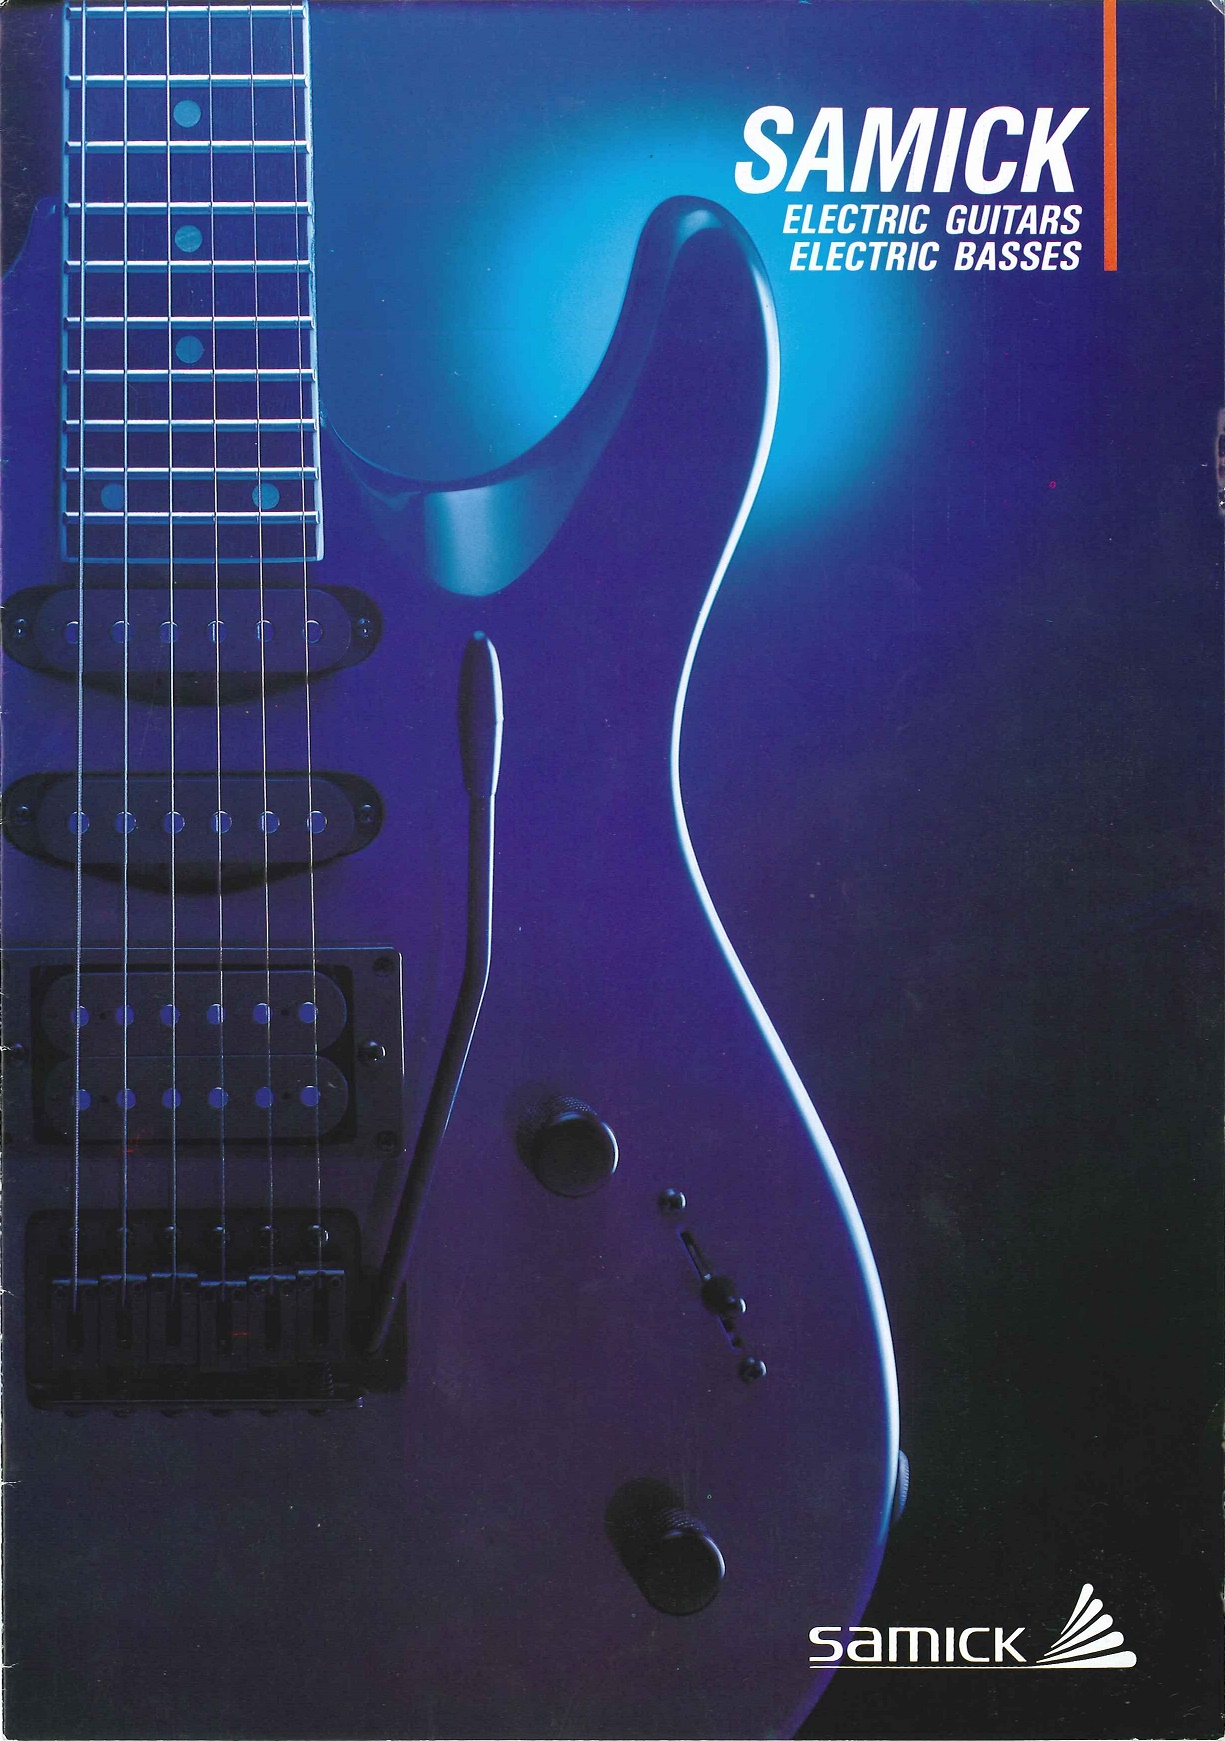 Samick Electric Guitar Wiring Diagram : Samick guitar wiring diagrams dean guitars diagram